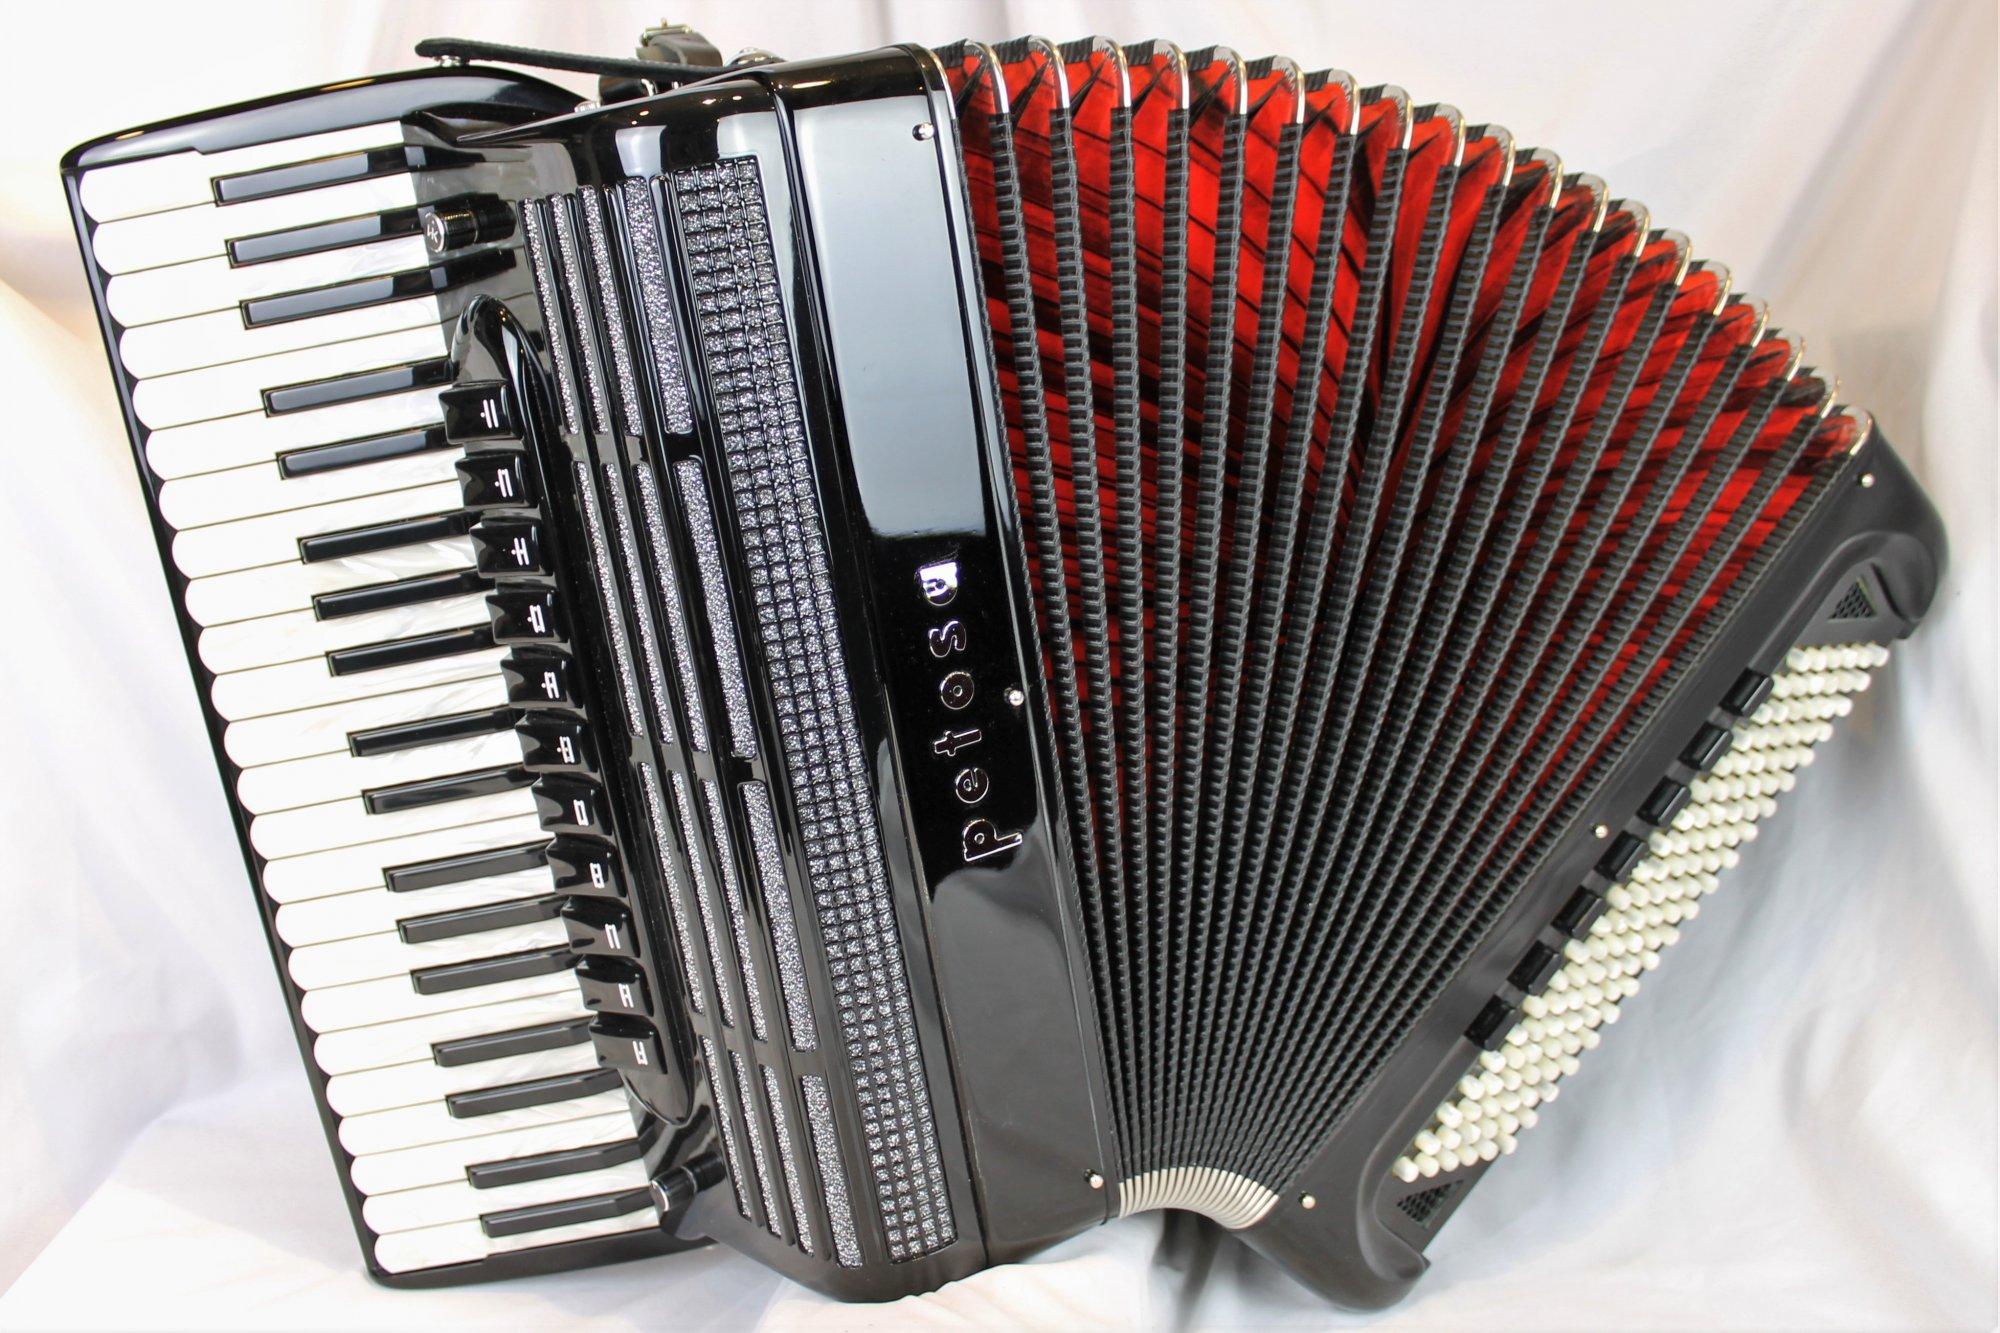 4854 - Black Petosa AM 1000 MF Piano Accordion LMMM 41 120